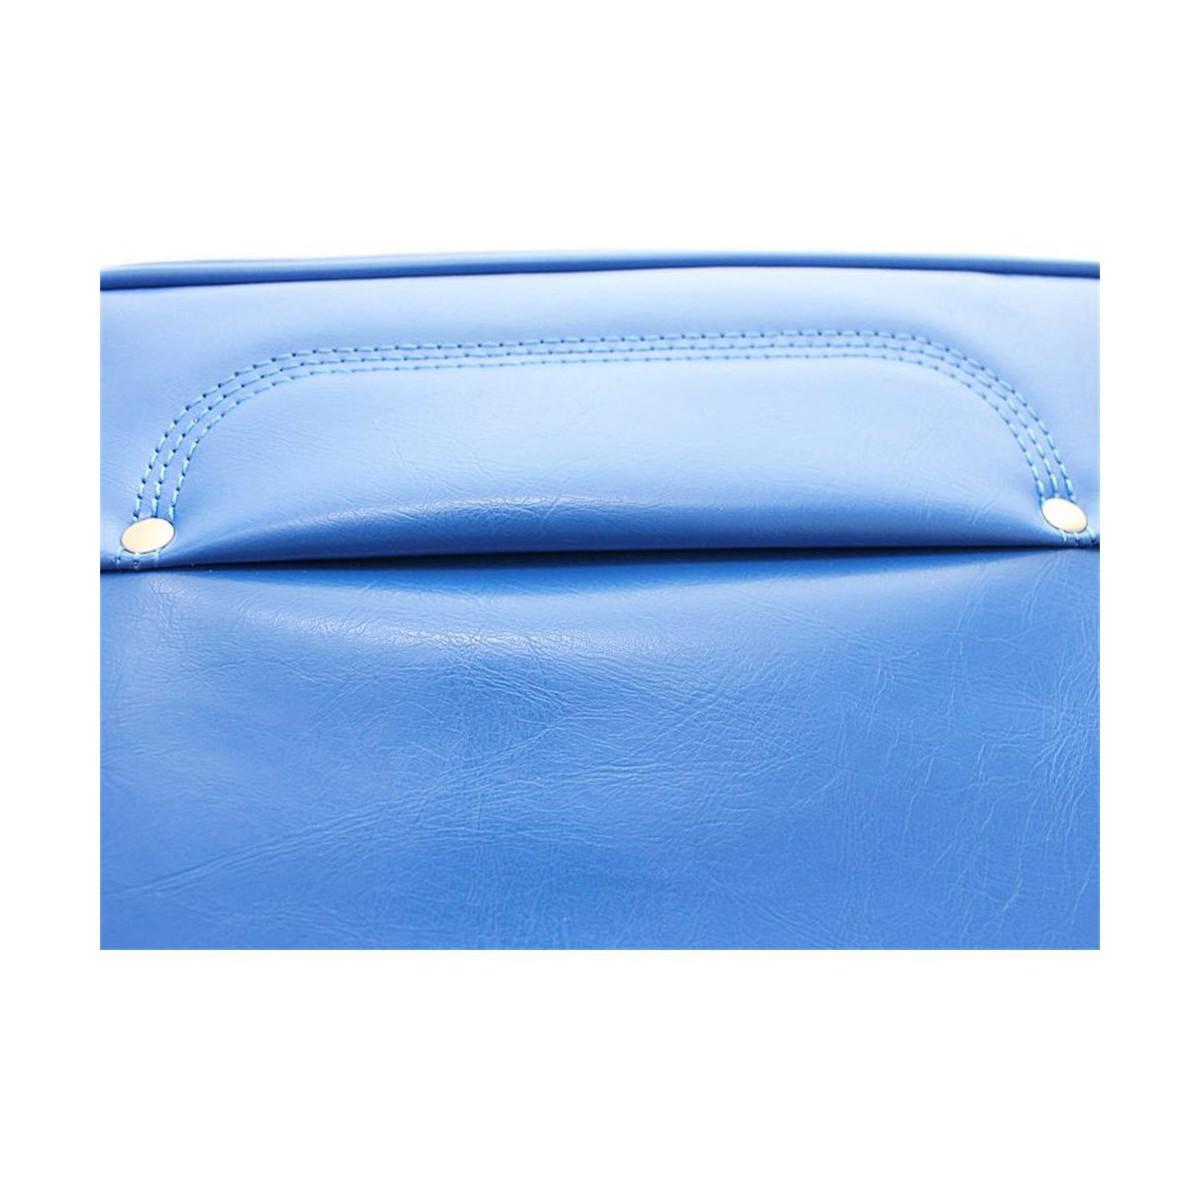 824b47b3d9d6 Nike Heritage Si Track Men s Bag In Blue in Blue for Men - Lyst